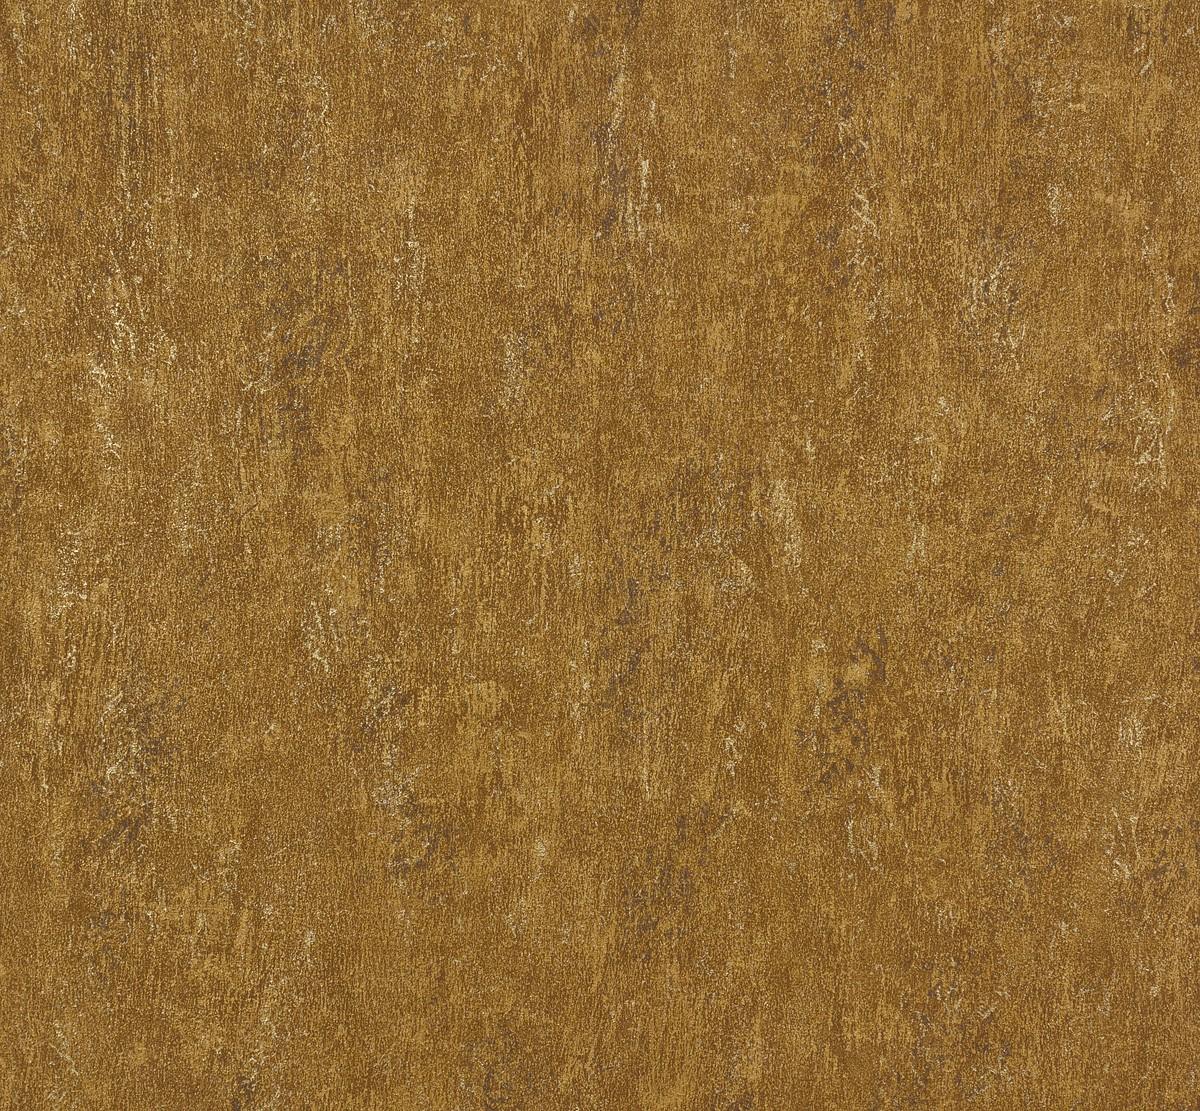 vliestapete beton gold p s origin 42107 10. Black Bedroom Furniture Sets. Home Design Ideas